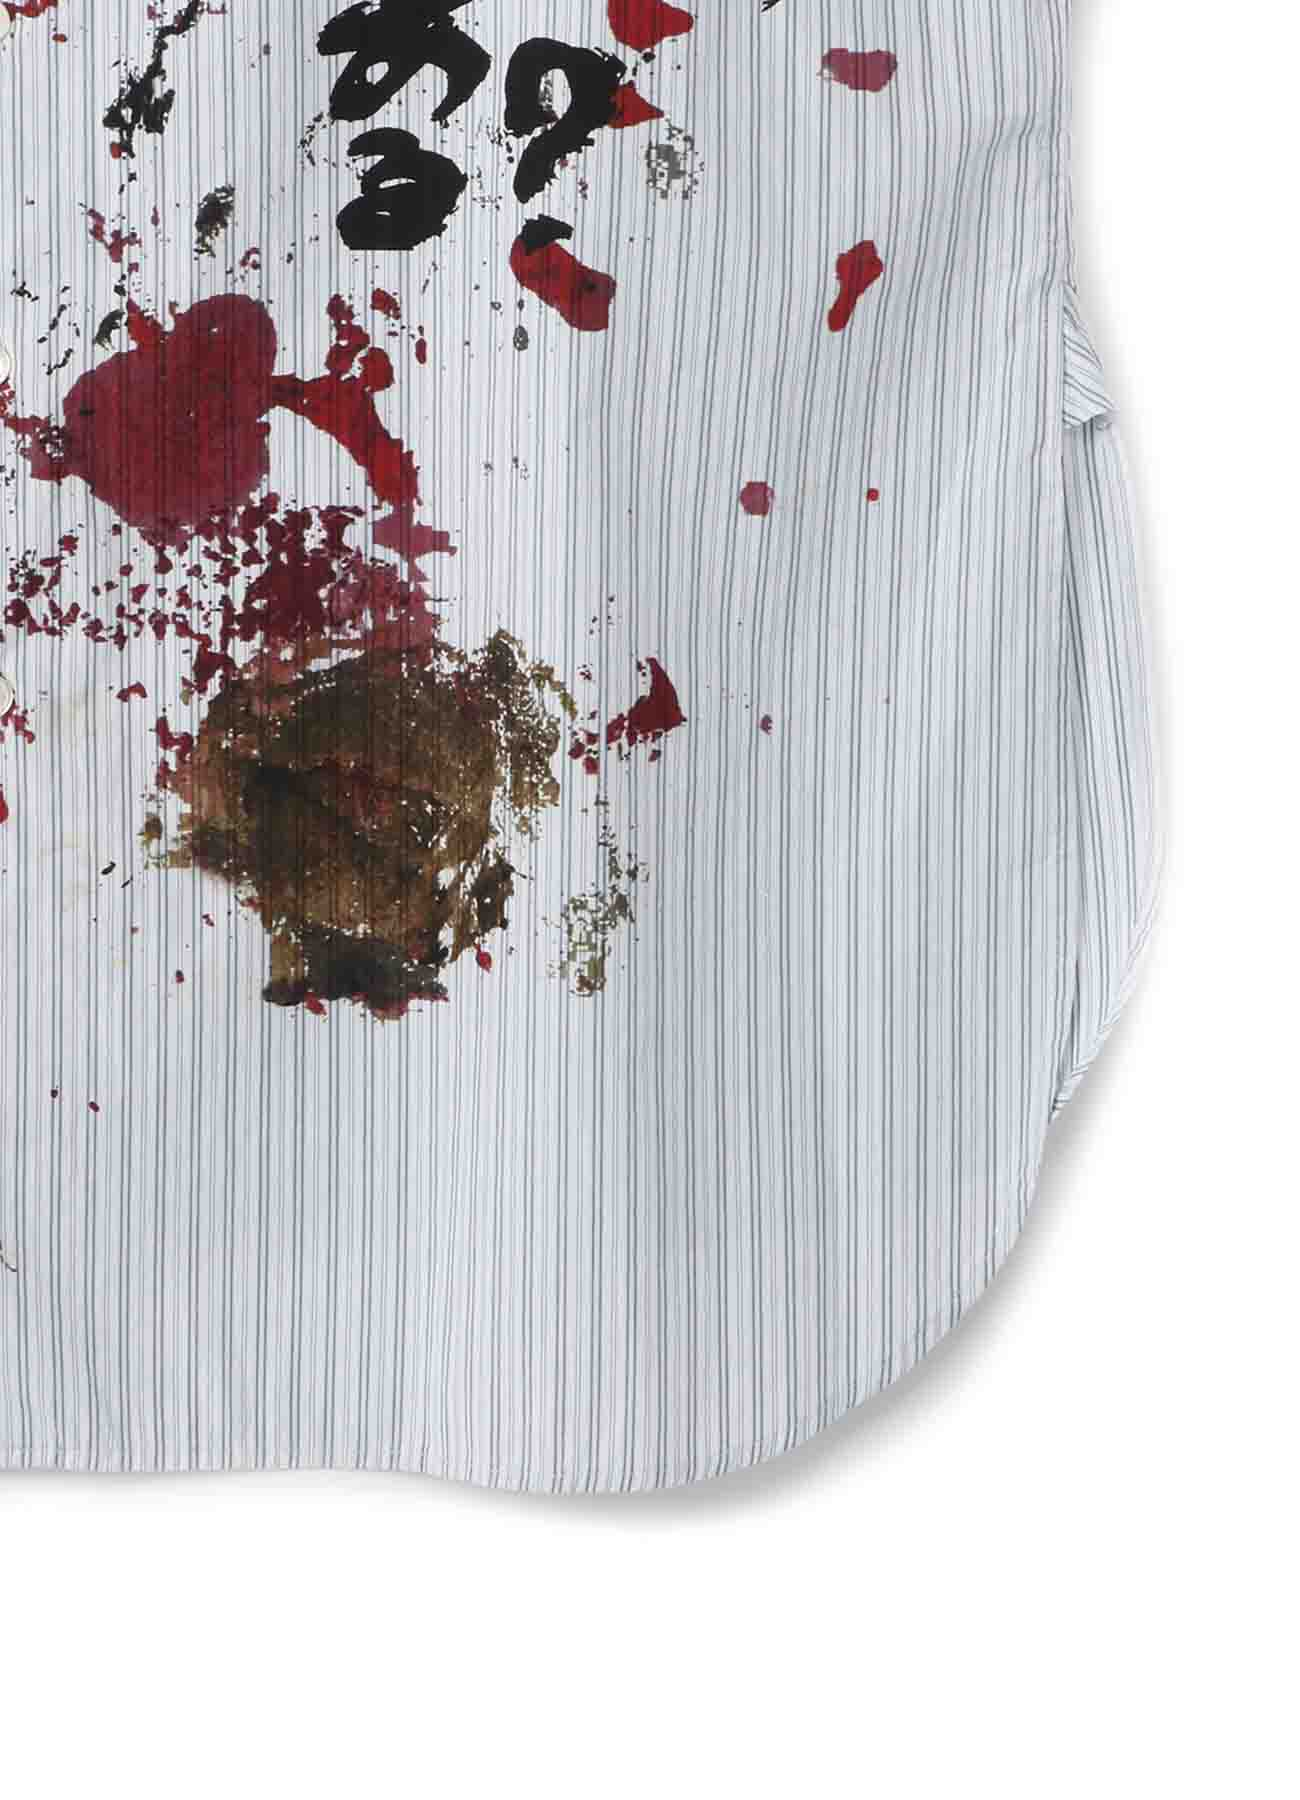 BLACK Scandal ストライプメッセージプリントオーバーシャツ